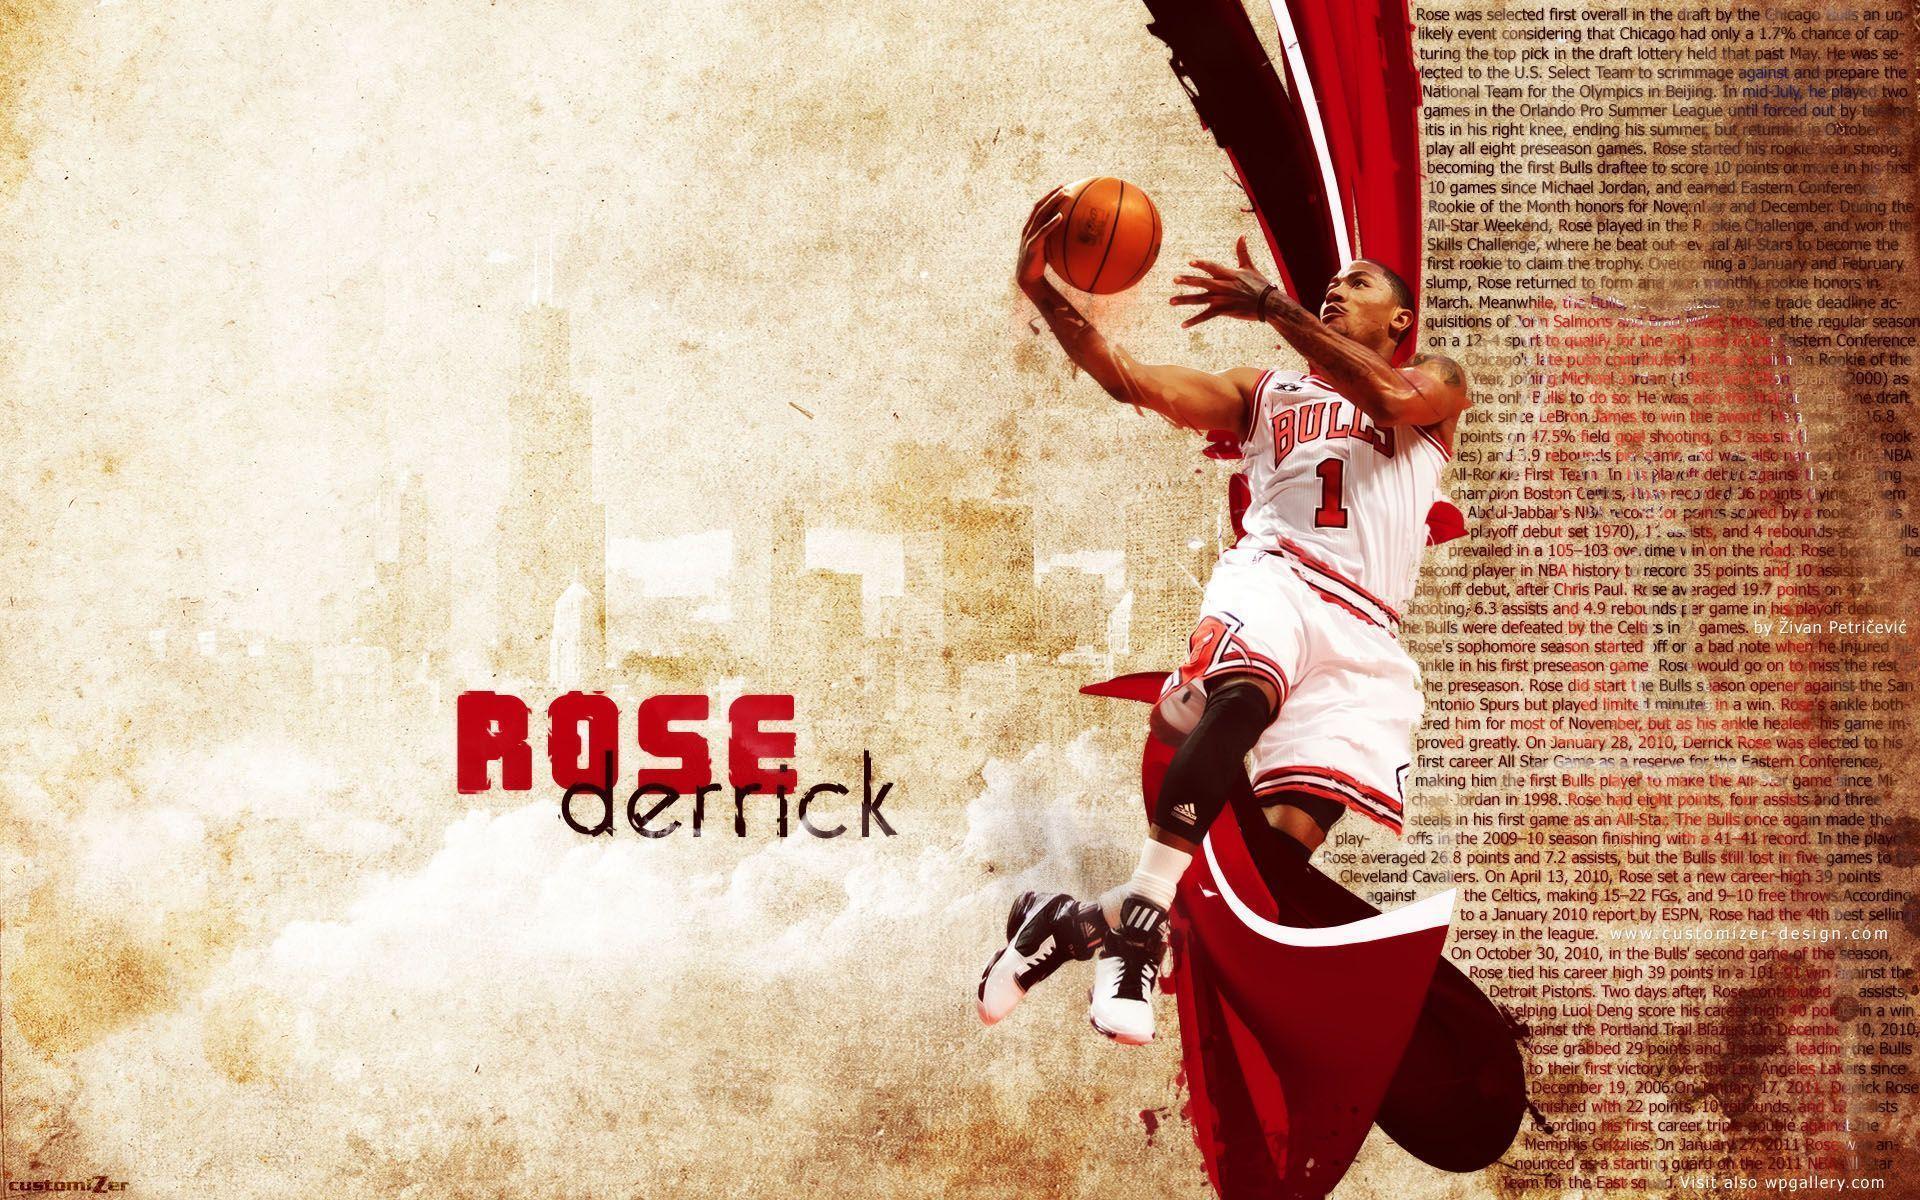 Derrick rose backgrounds wallpaper cave - Derrick rose cool wallpaper ...